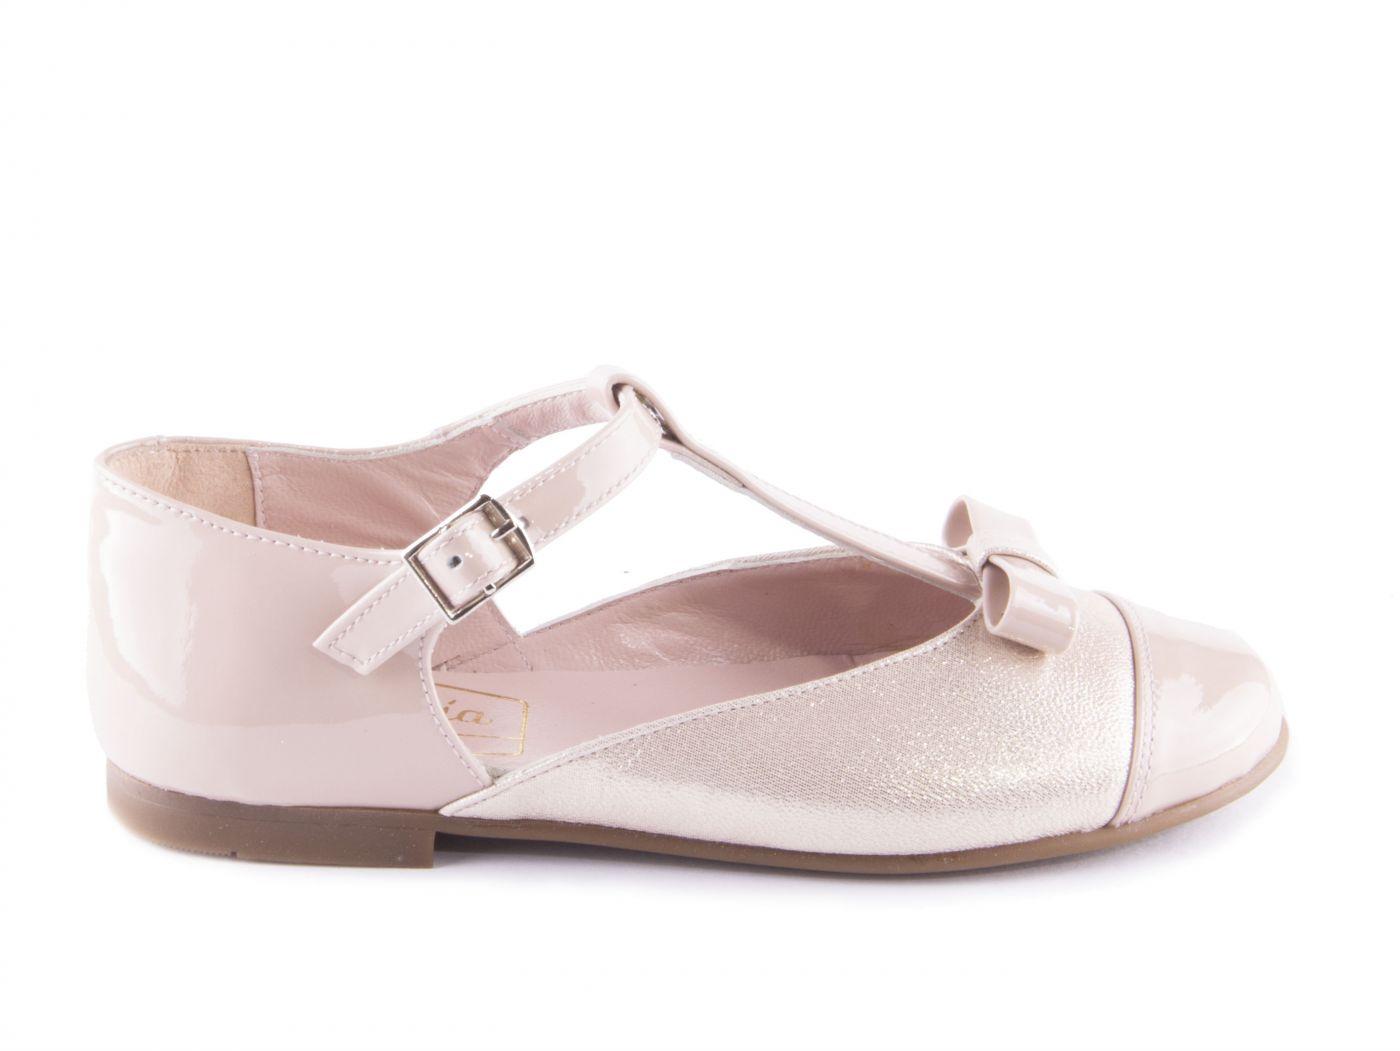 ff24f407d26 Comprar zapato tipo JOVEN NIÑA estilo MERCEDES COLOR ROSA METALIZADO ...